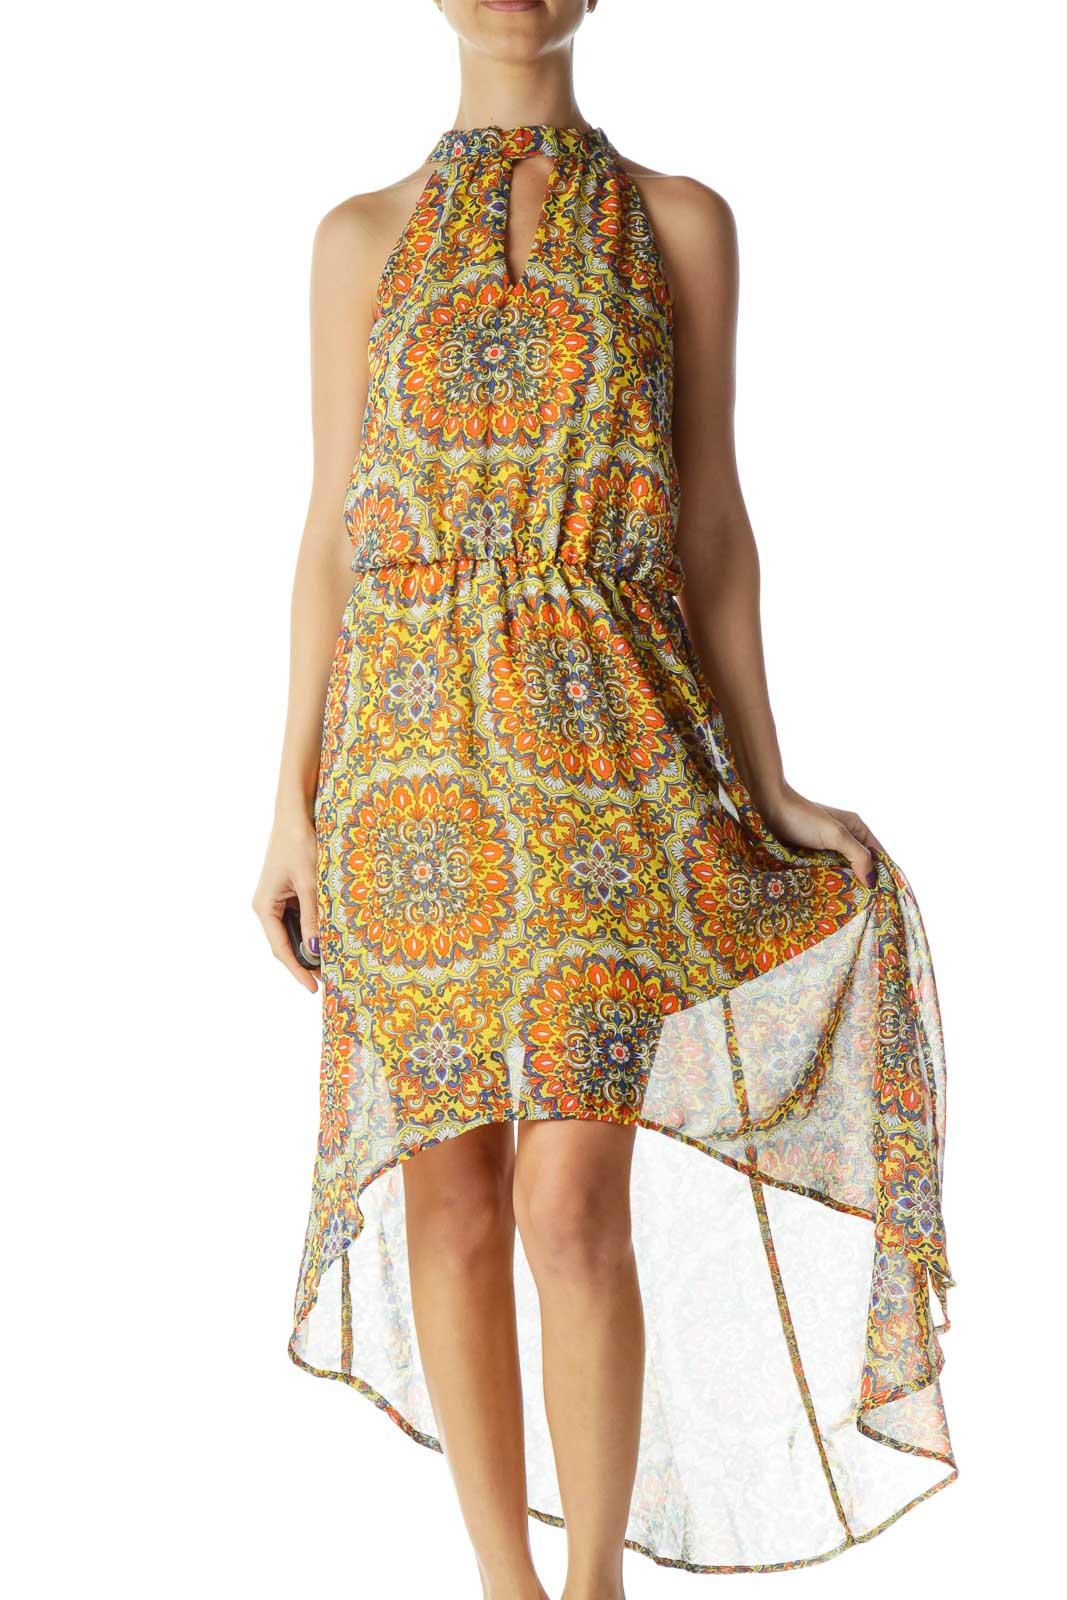 Yellow Orange Blue White High-Low Sleeveless Dress Front